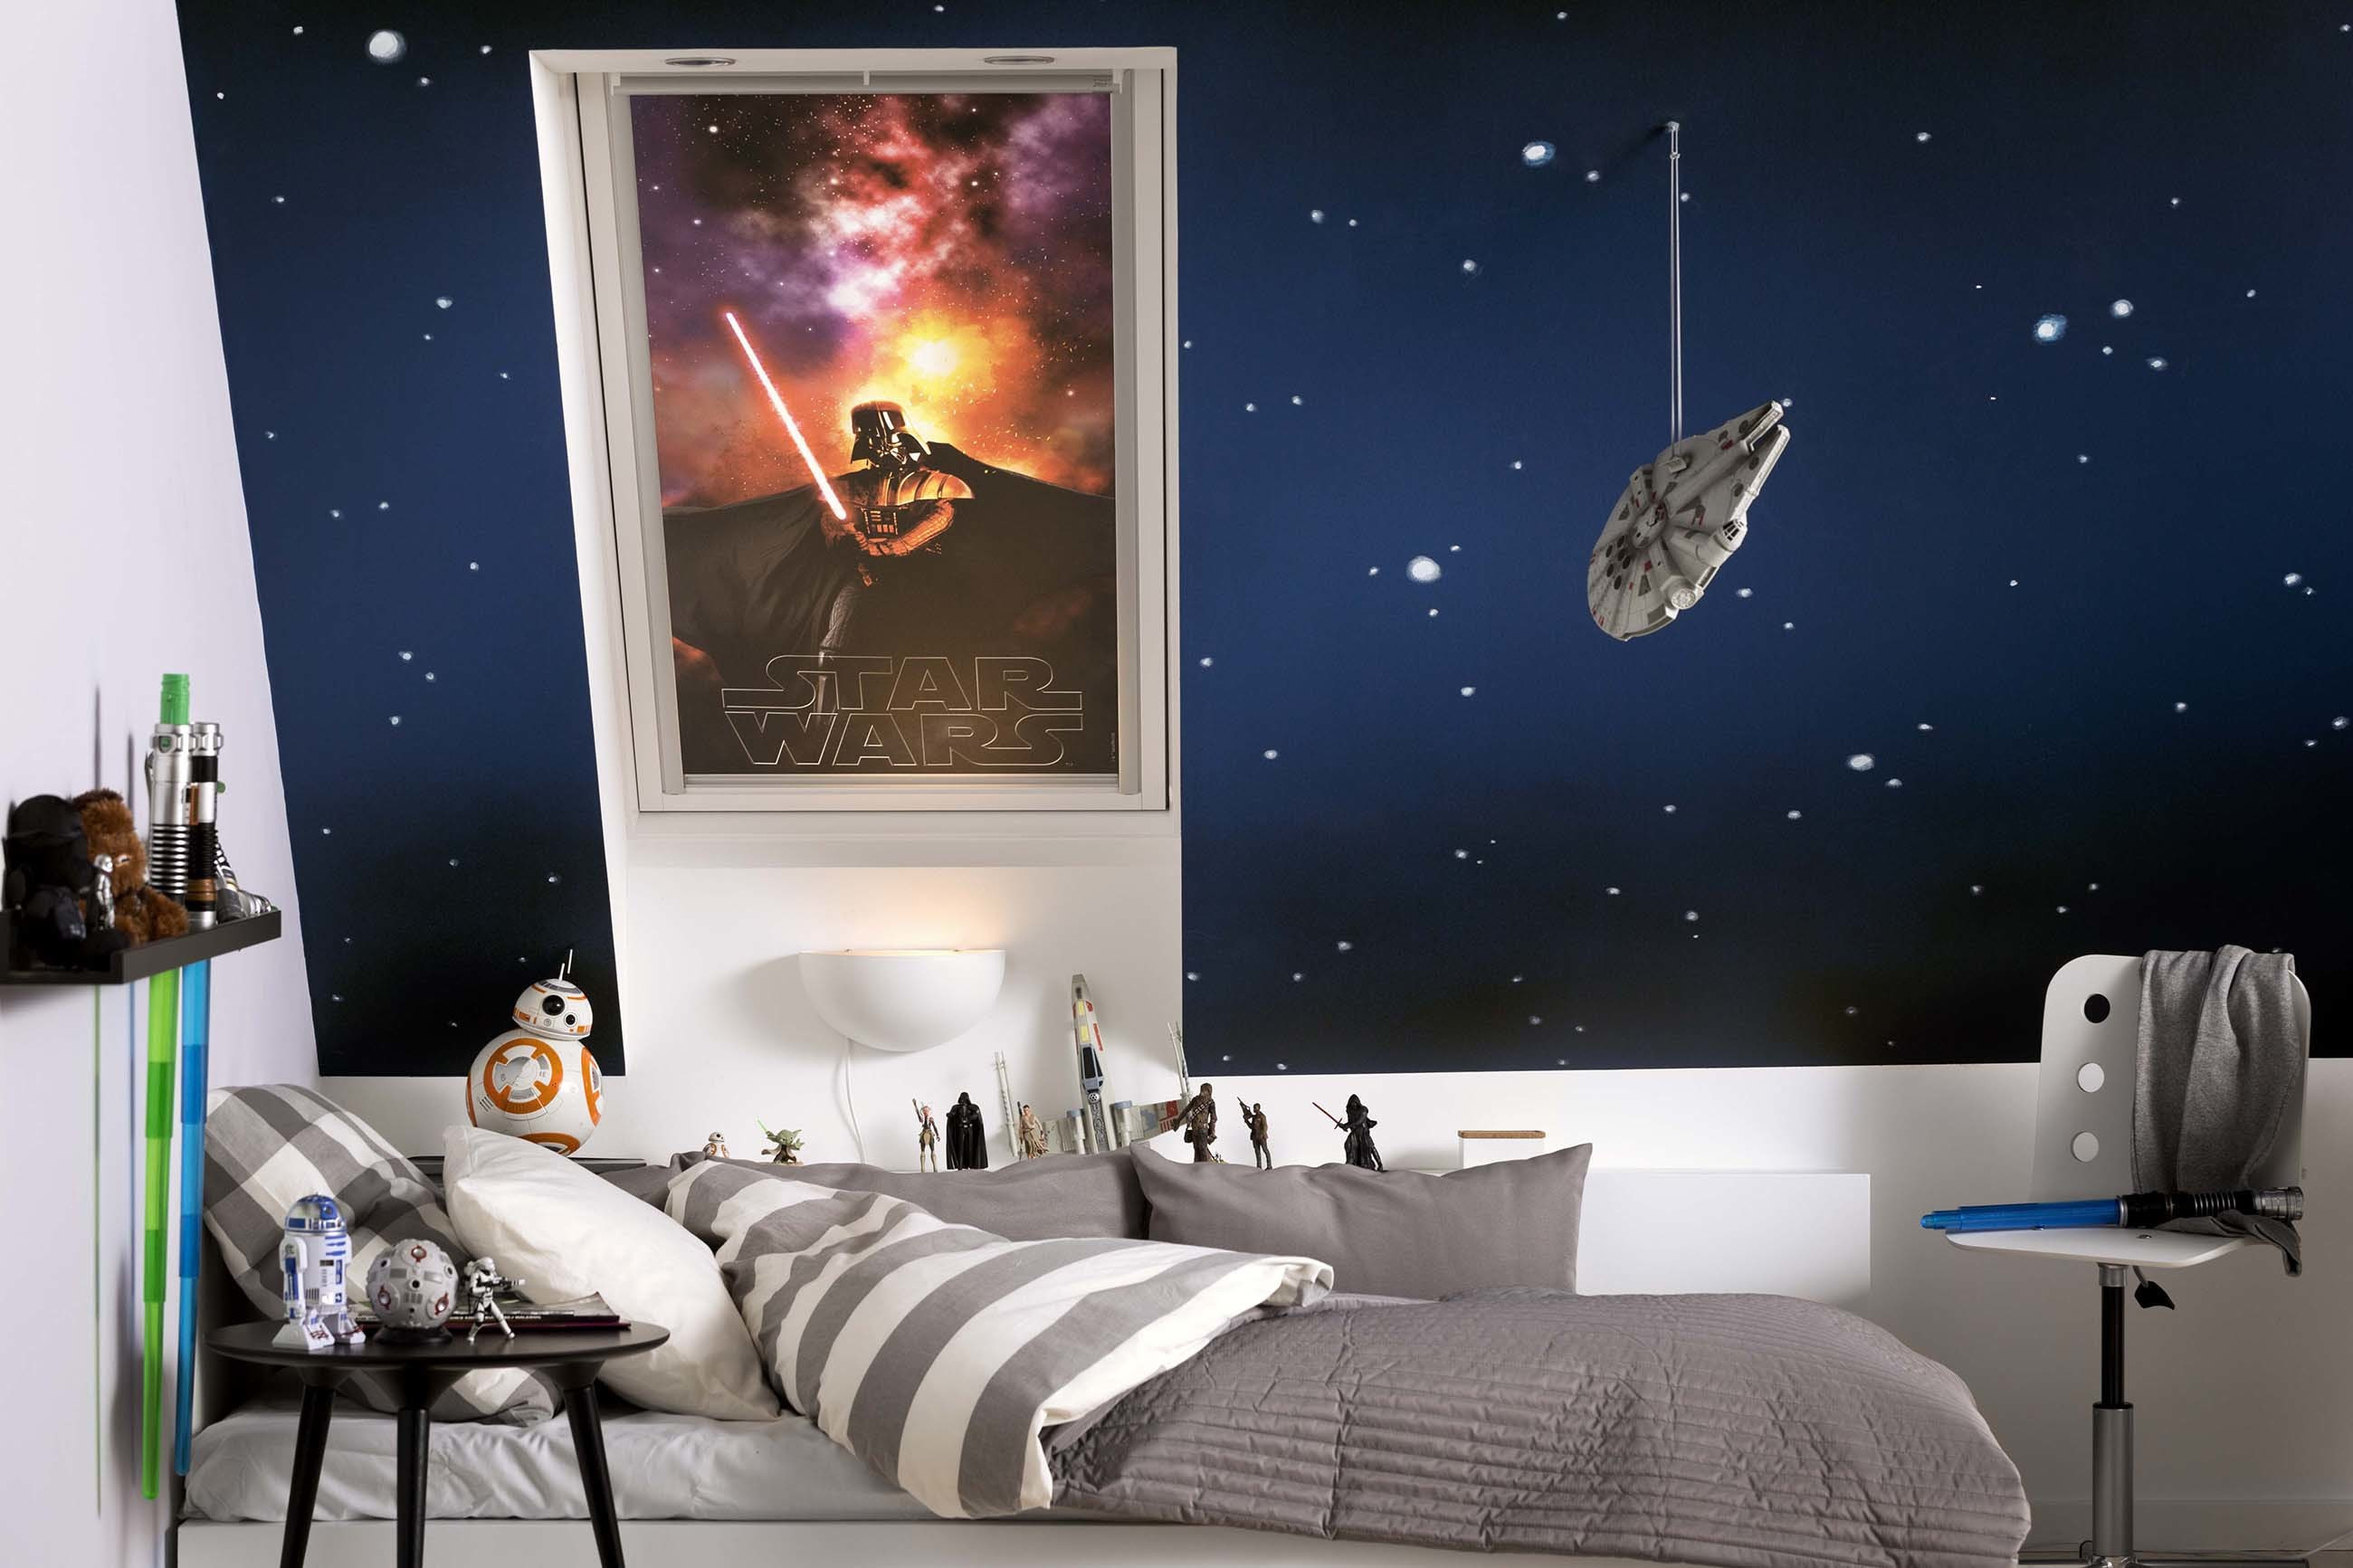 Star Wars Wallpaper For Room 42 Images